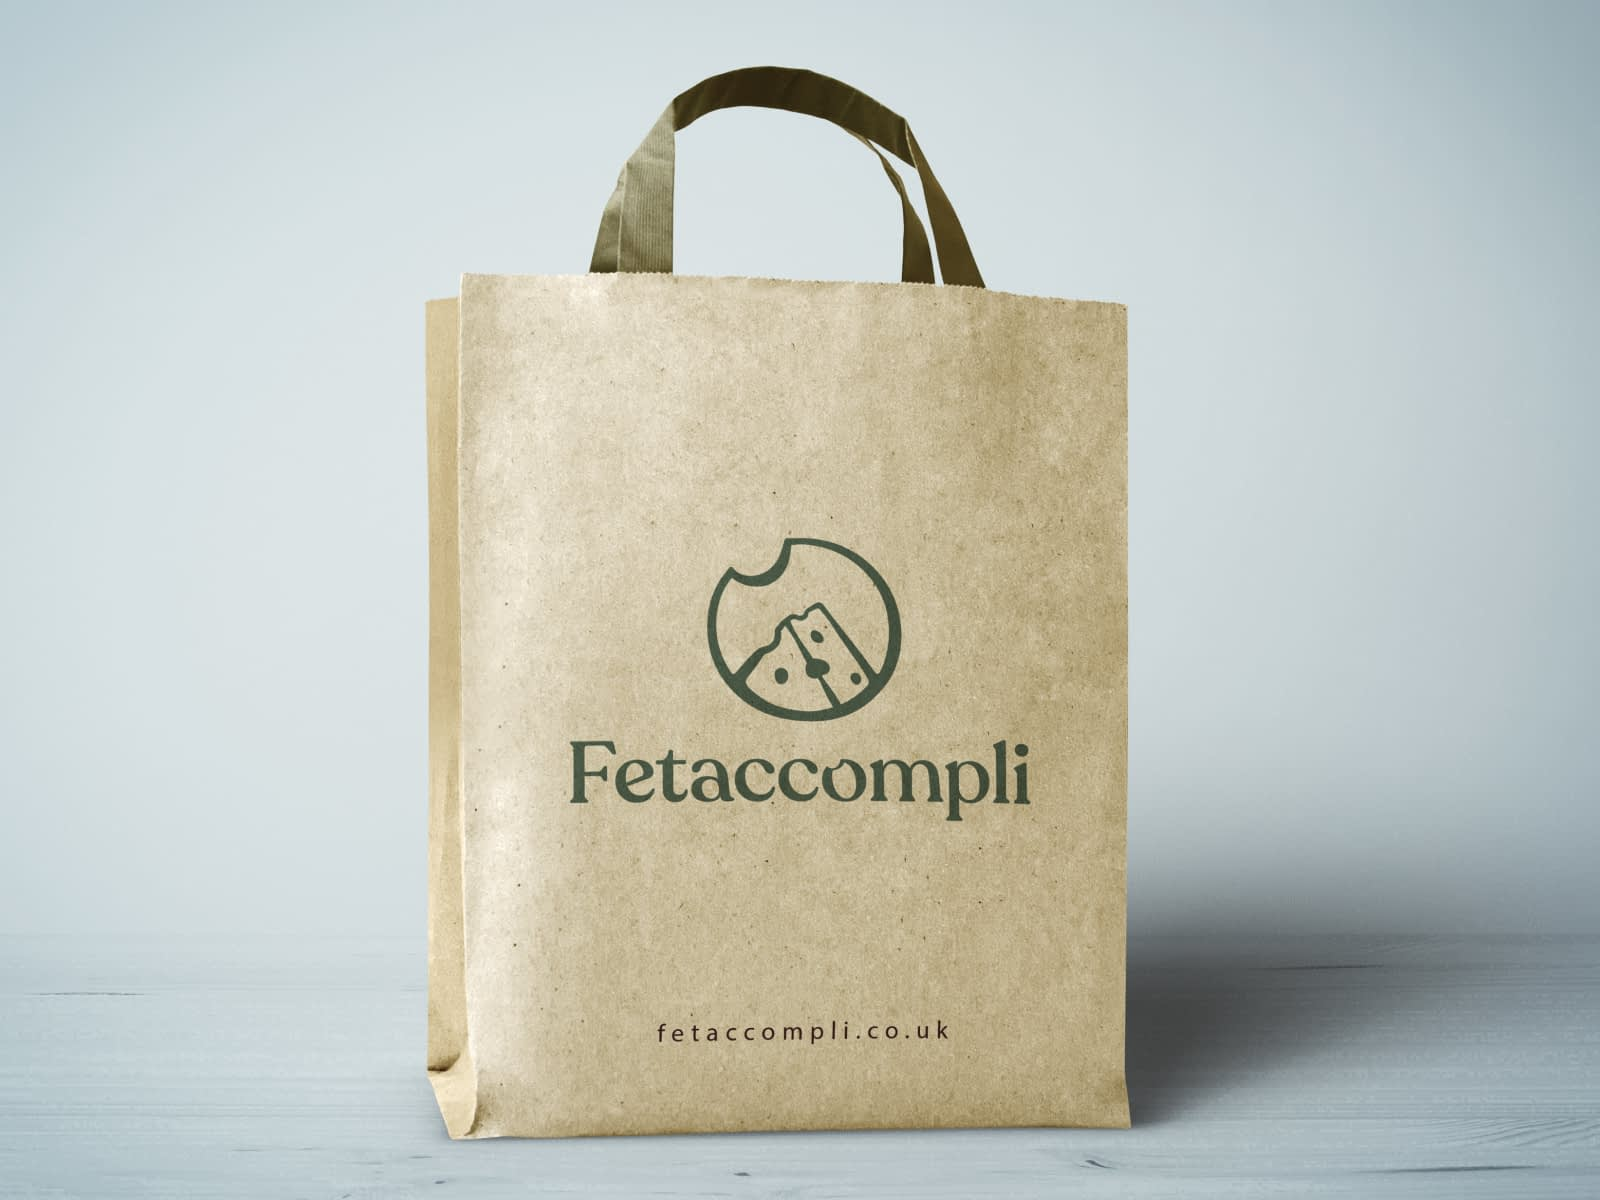 Fetaccompli_logo_dribbble3